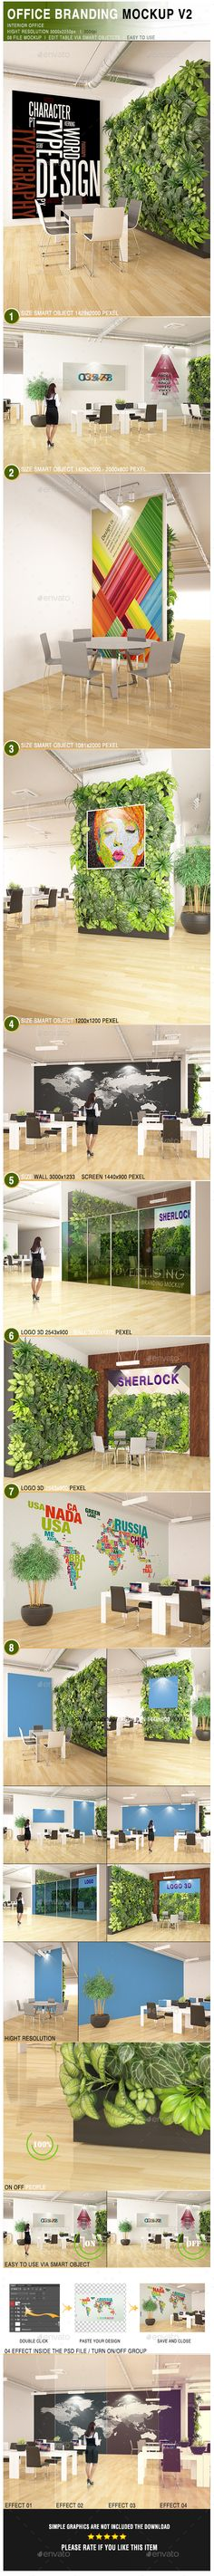 Office Branding Mockup. Download here: https://graphicriver.net/item/office-branding-mockup-v2/17650895?ref=ksioks